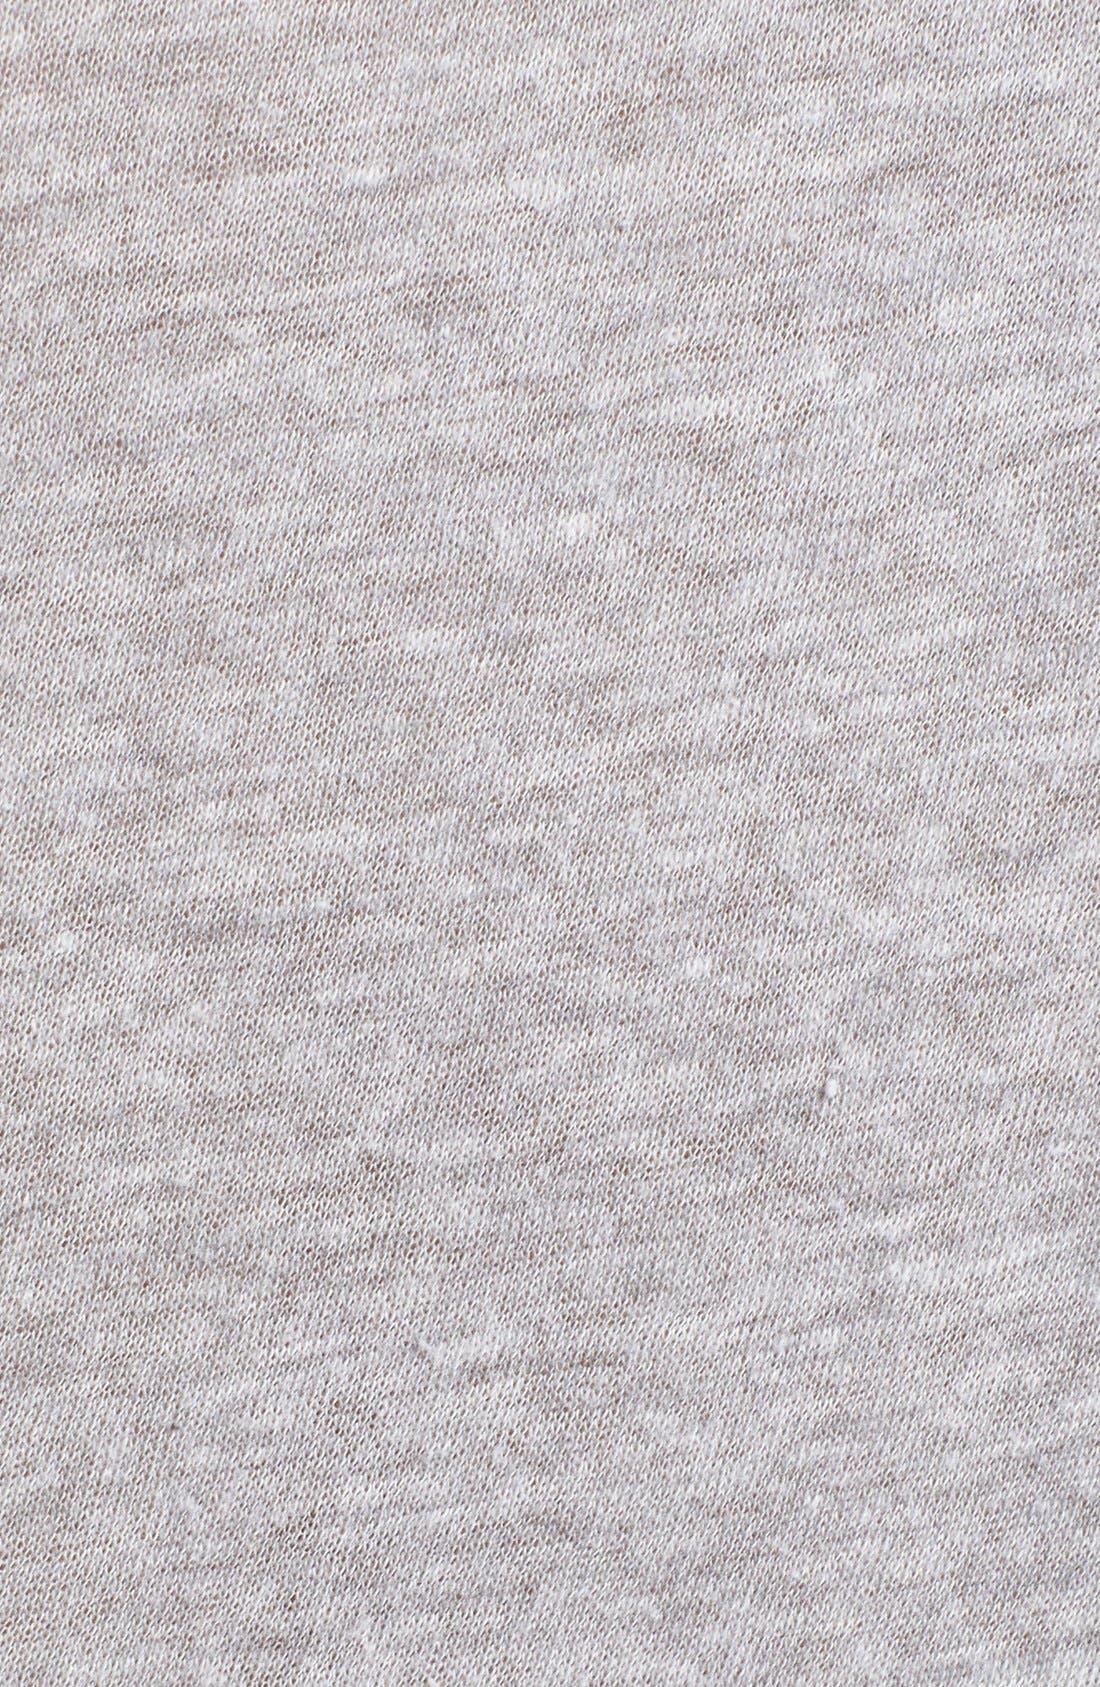 Alternate Image 3  - Wildfox Heathered Jersey Pullover